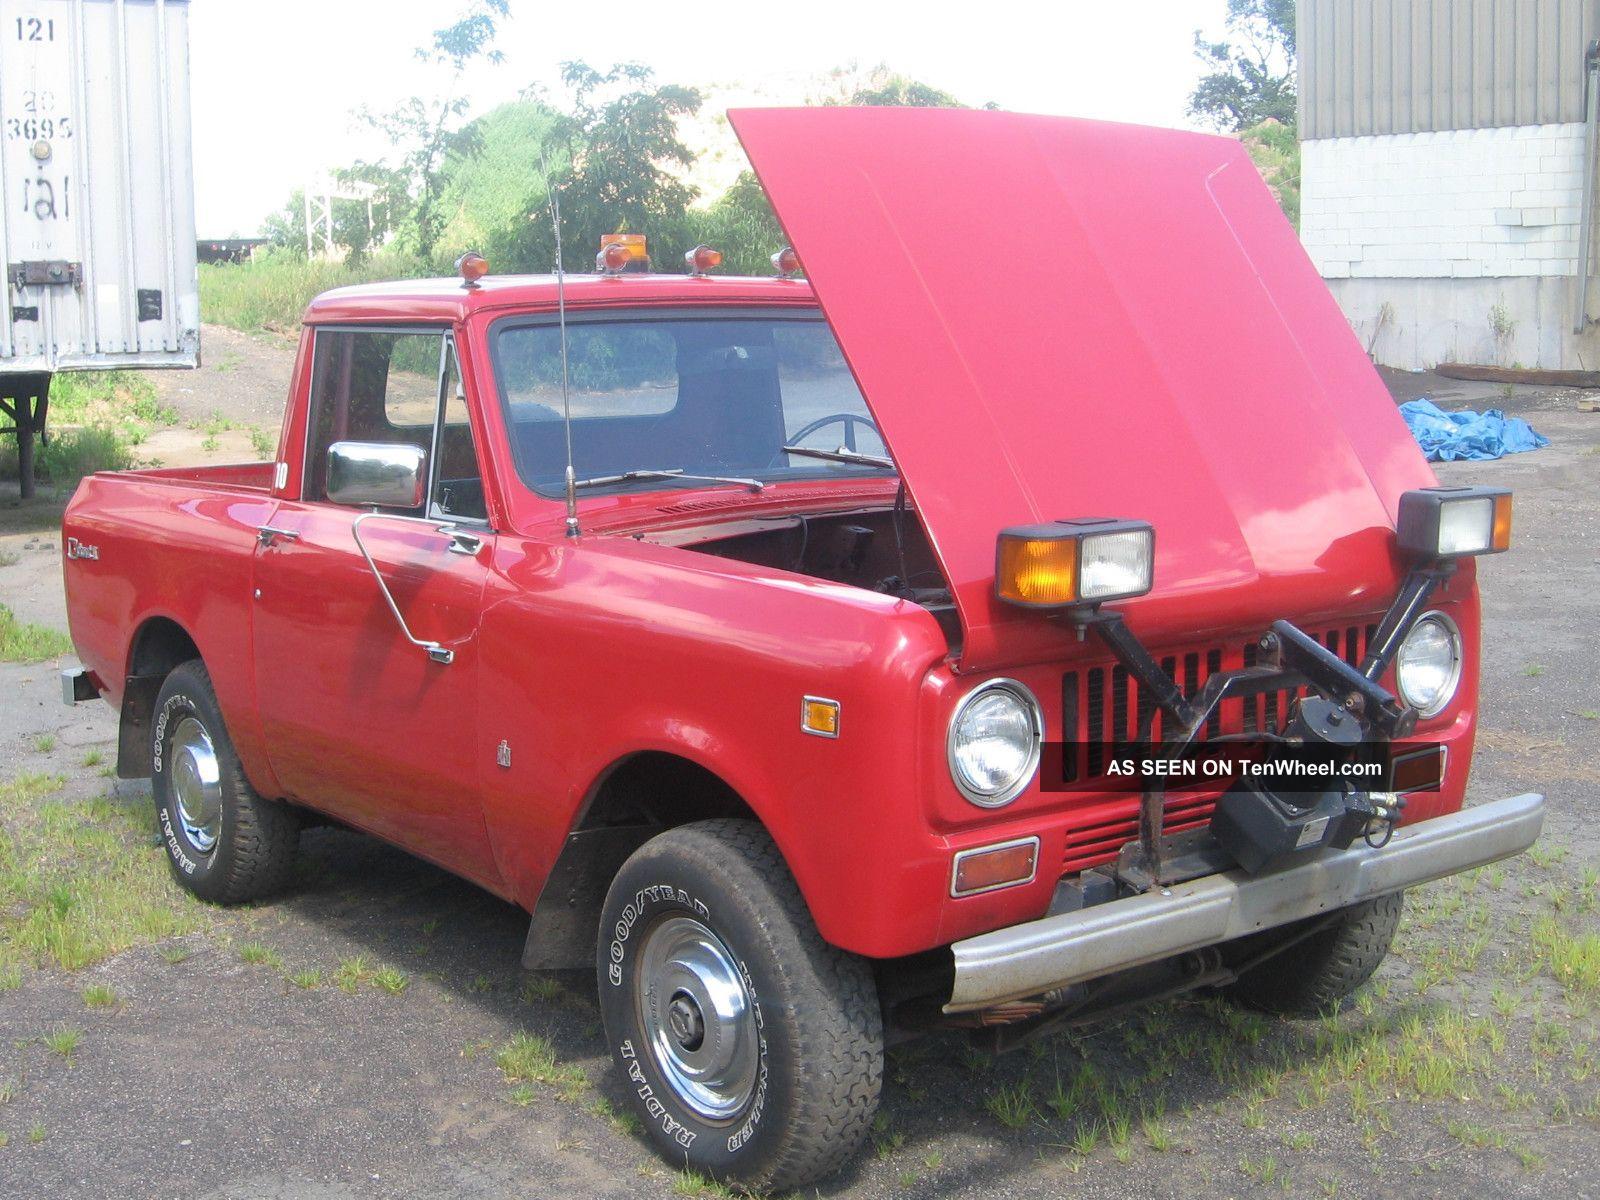 1973 International Scout Ii, Manuel Trans, 4x4 Pick Up Truck